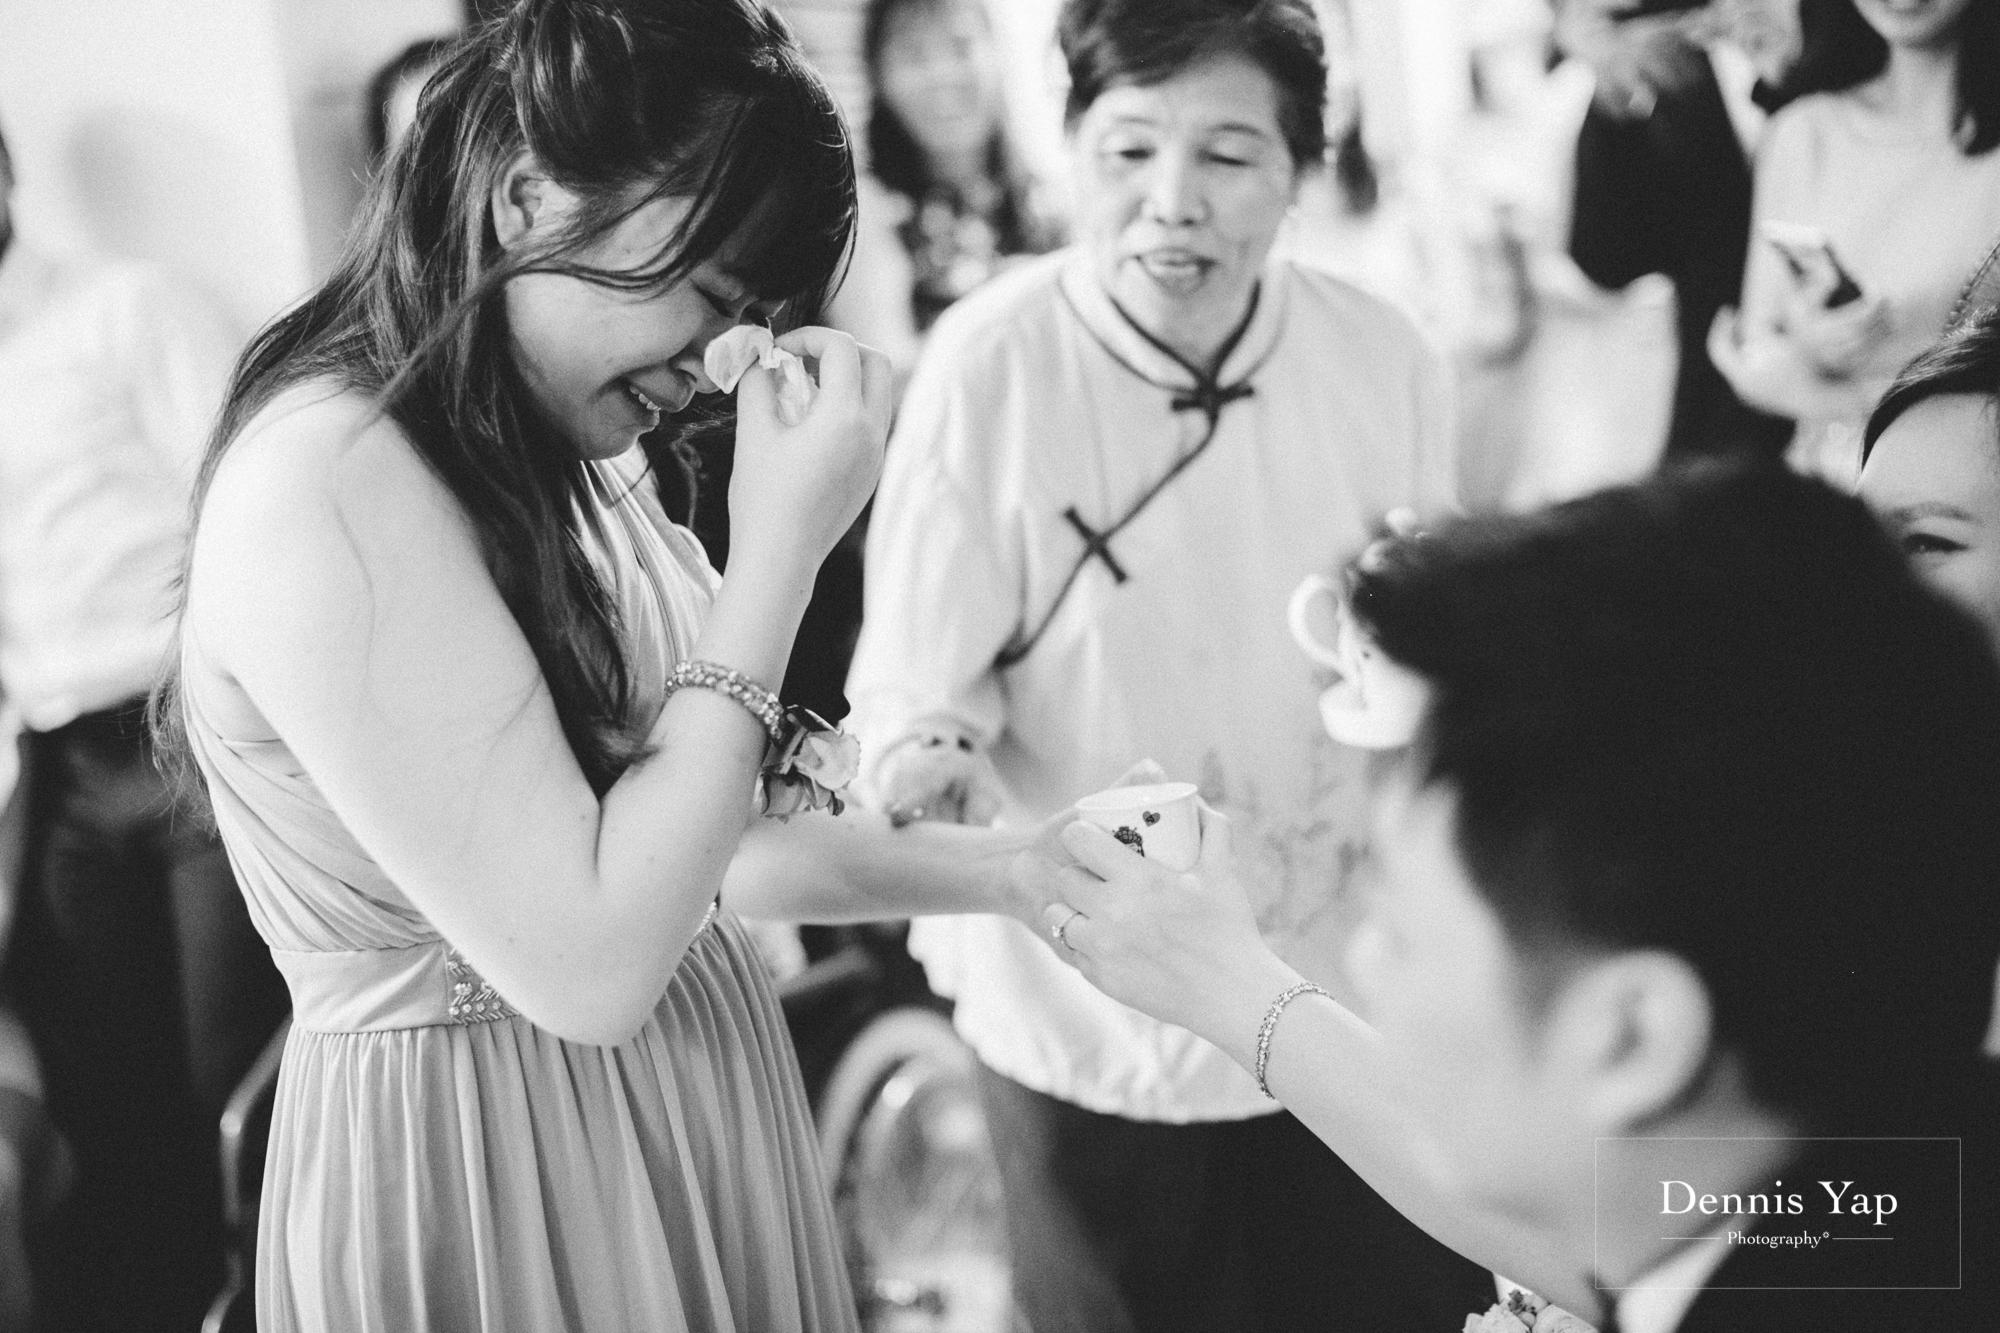 ino sheri black white church wedding st thomas more subang jaya dennis yap photography touching love beloved australia indonesia-20.jpg